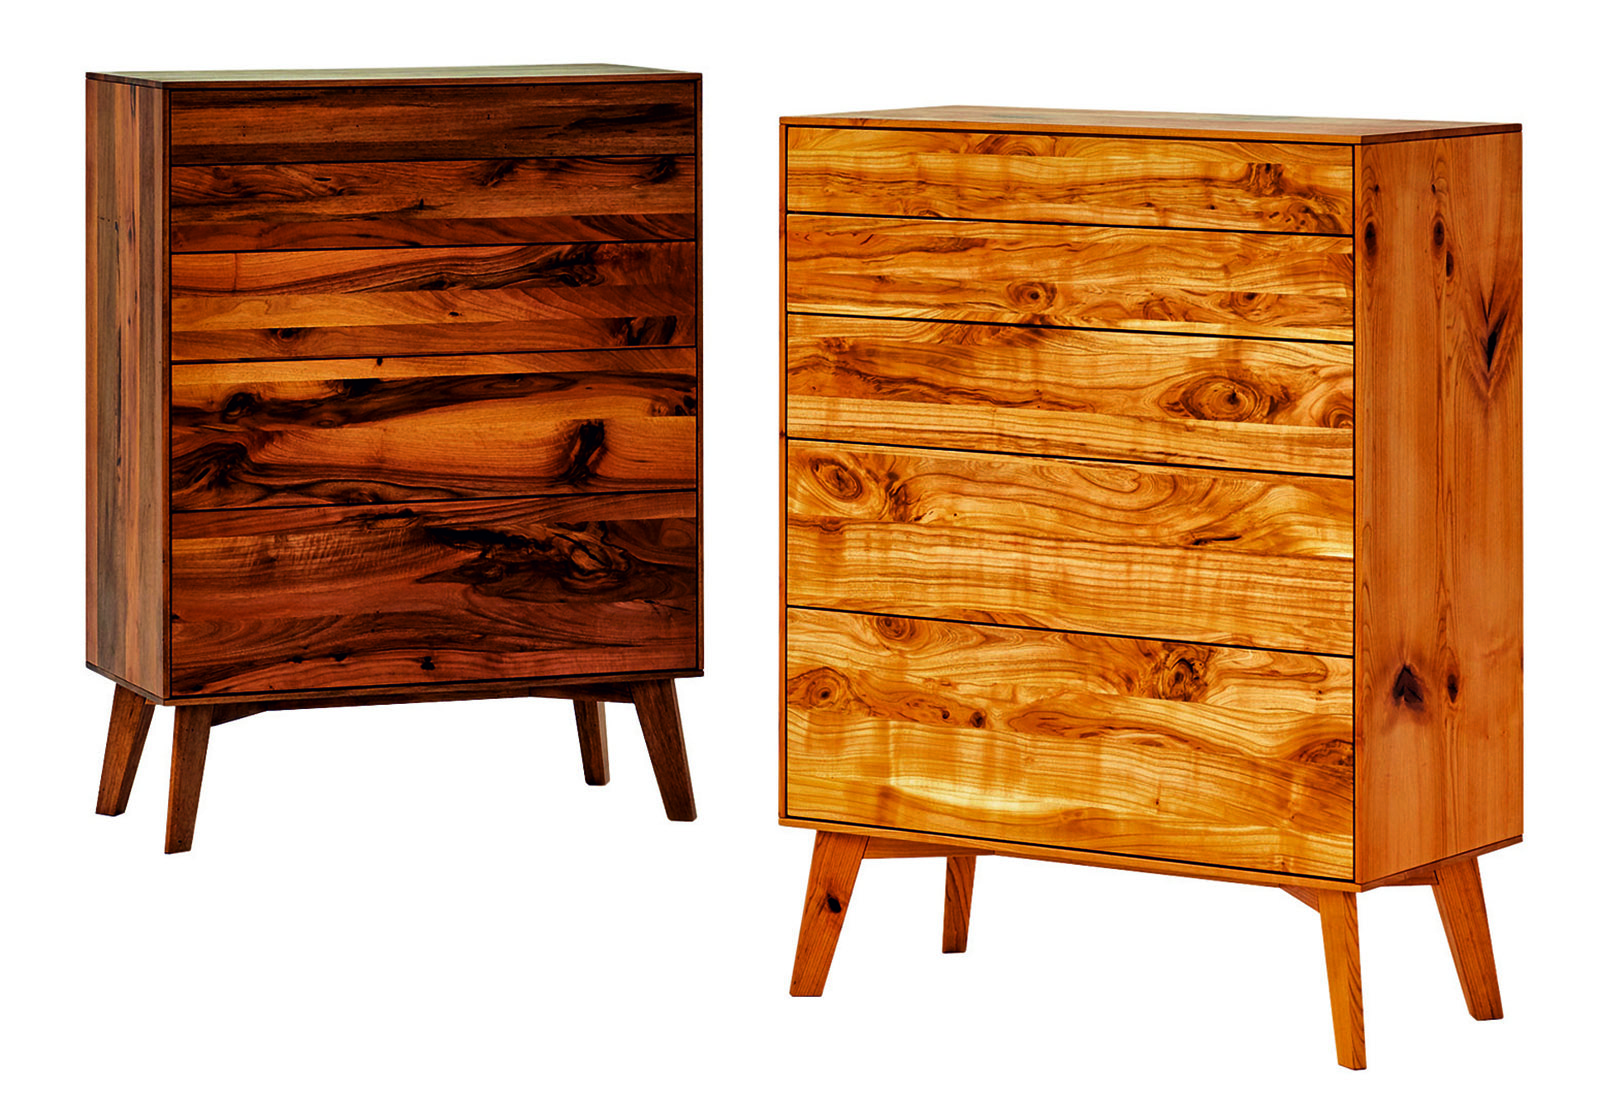 FINN chest of drawers